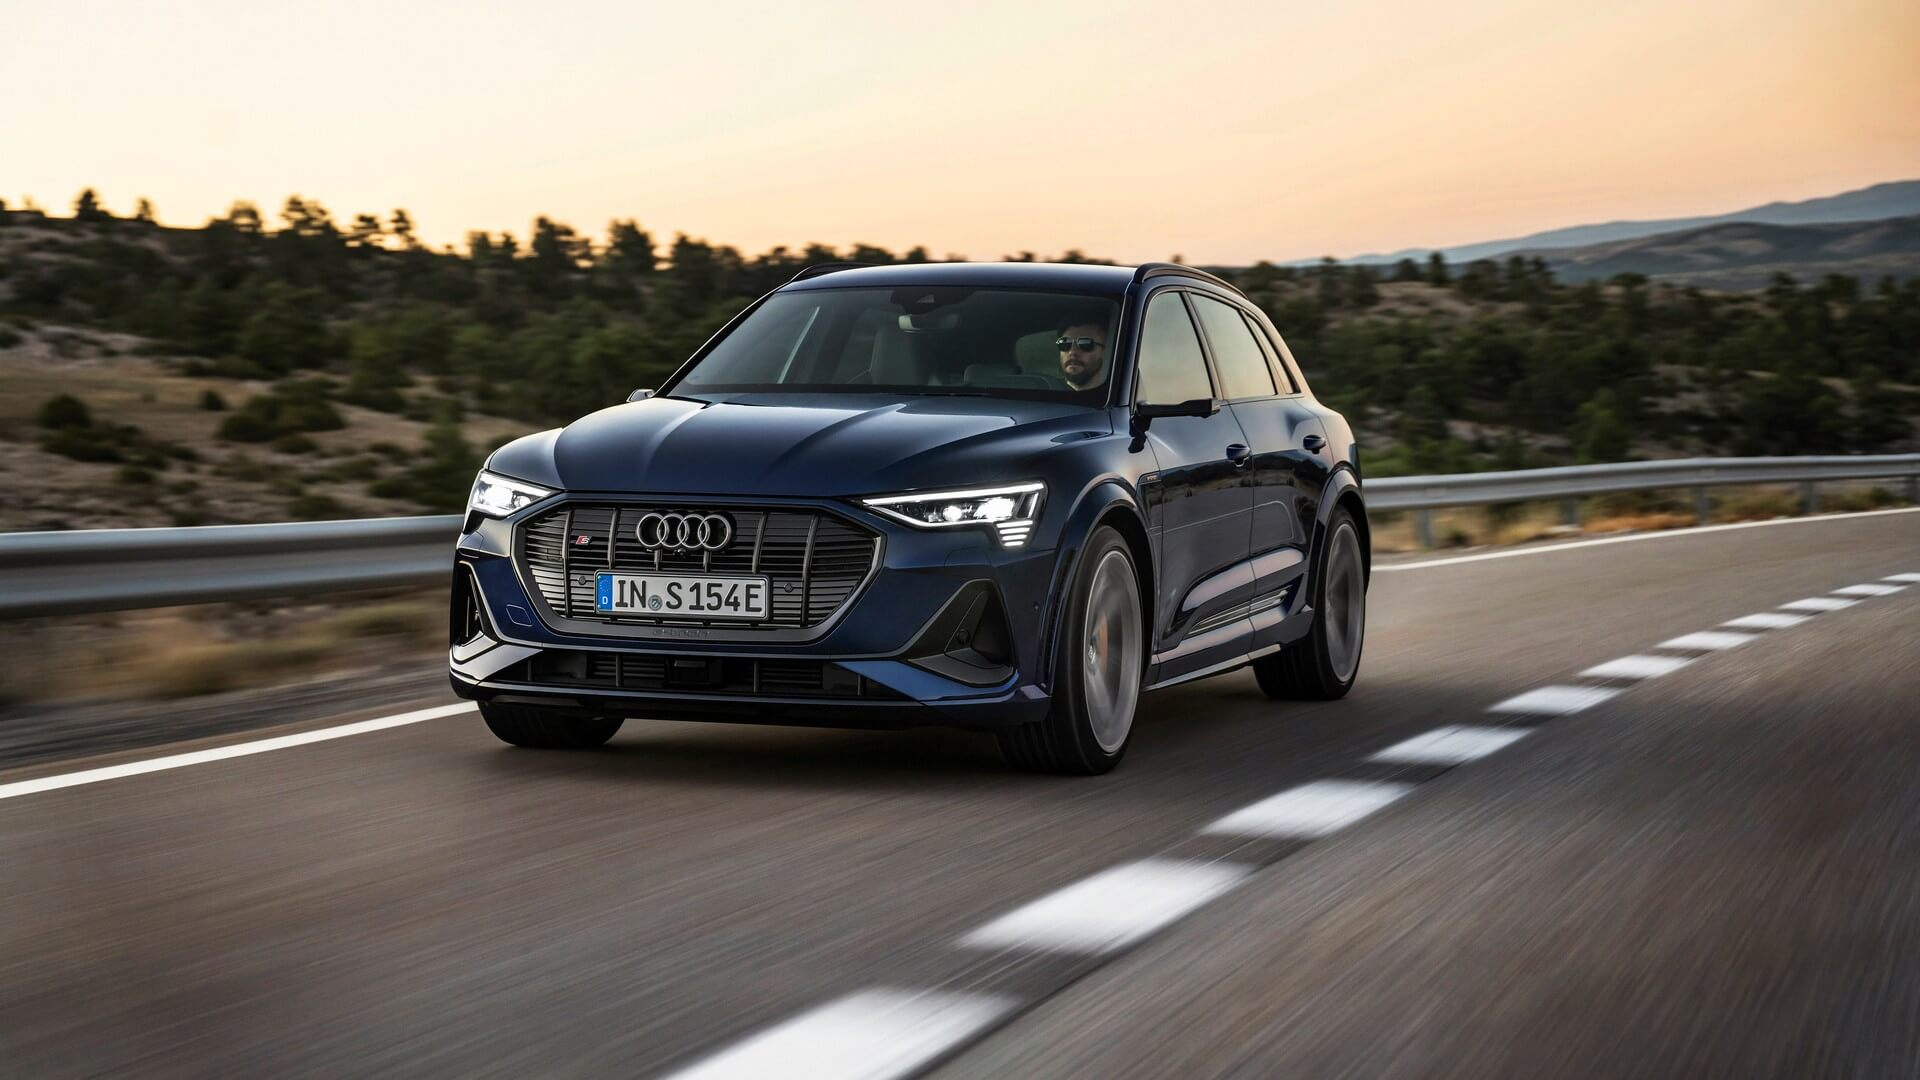 Audi-E-Tron-S-and-E-Tron-S-Sportback-2020-19